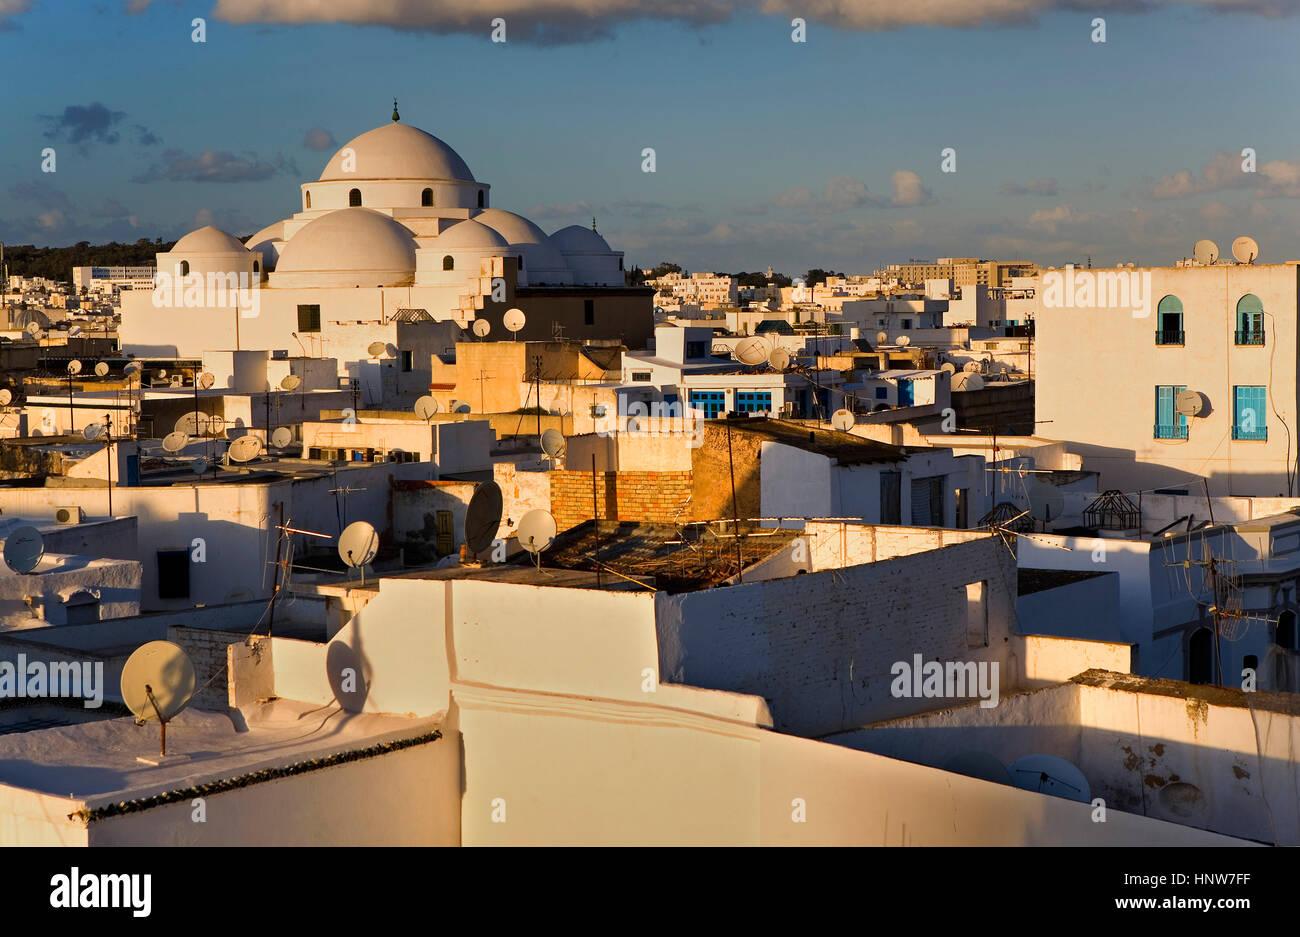 Tunisia: City of Tunis.skyline of Tunis. At left Sidi Mahrez Mosque. - Stock Image